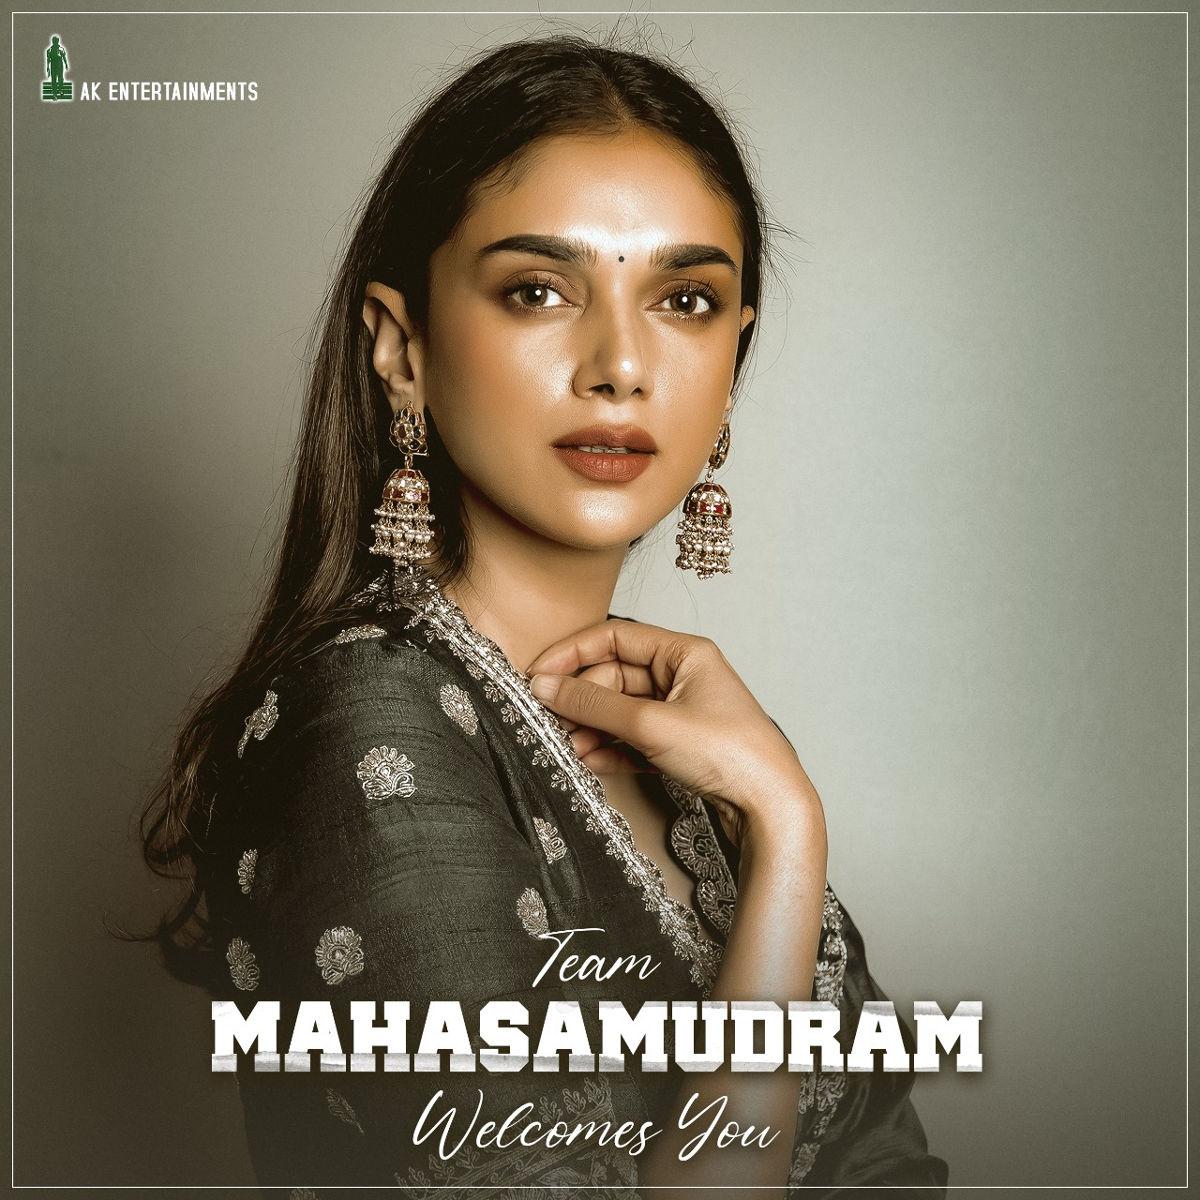 Actress Aditi Rao Hydari To Play Female Lead In Maha Samudram Movie